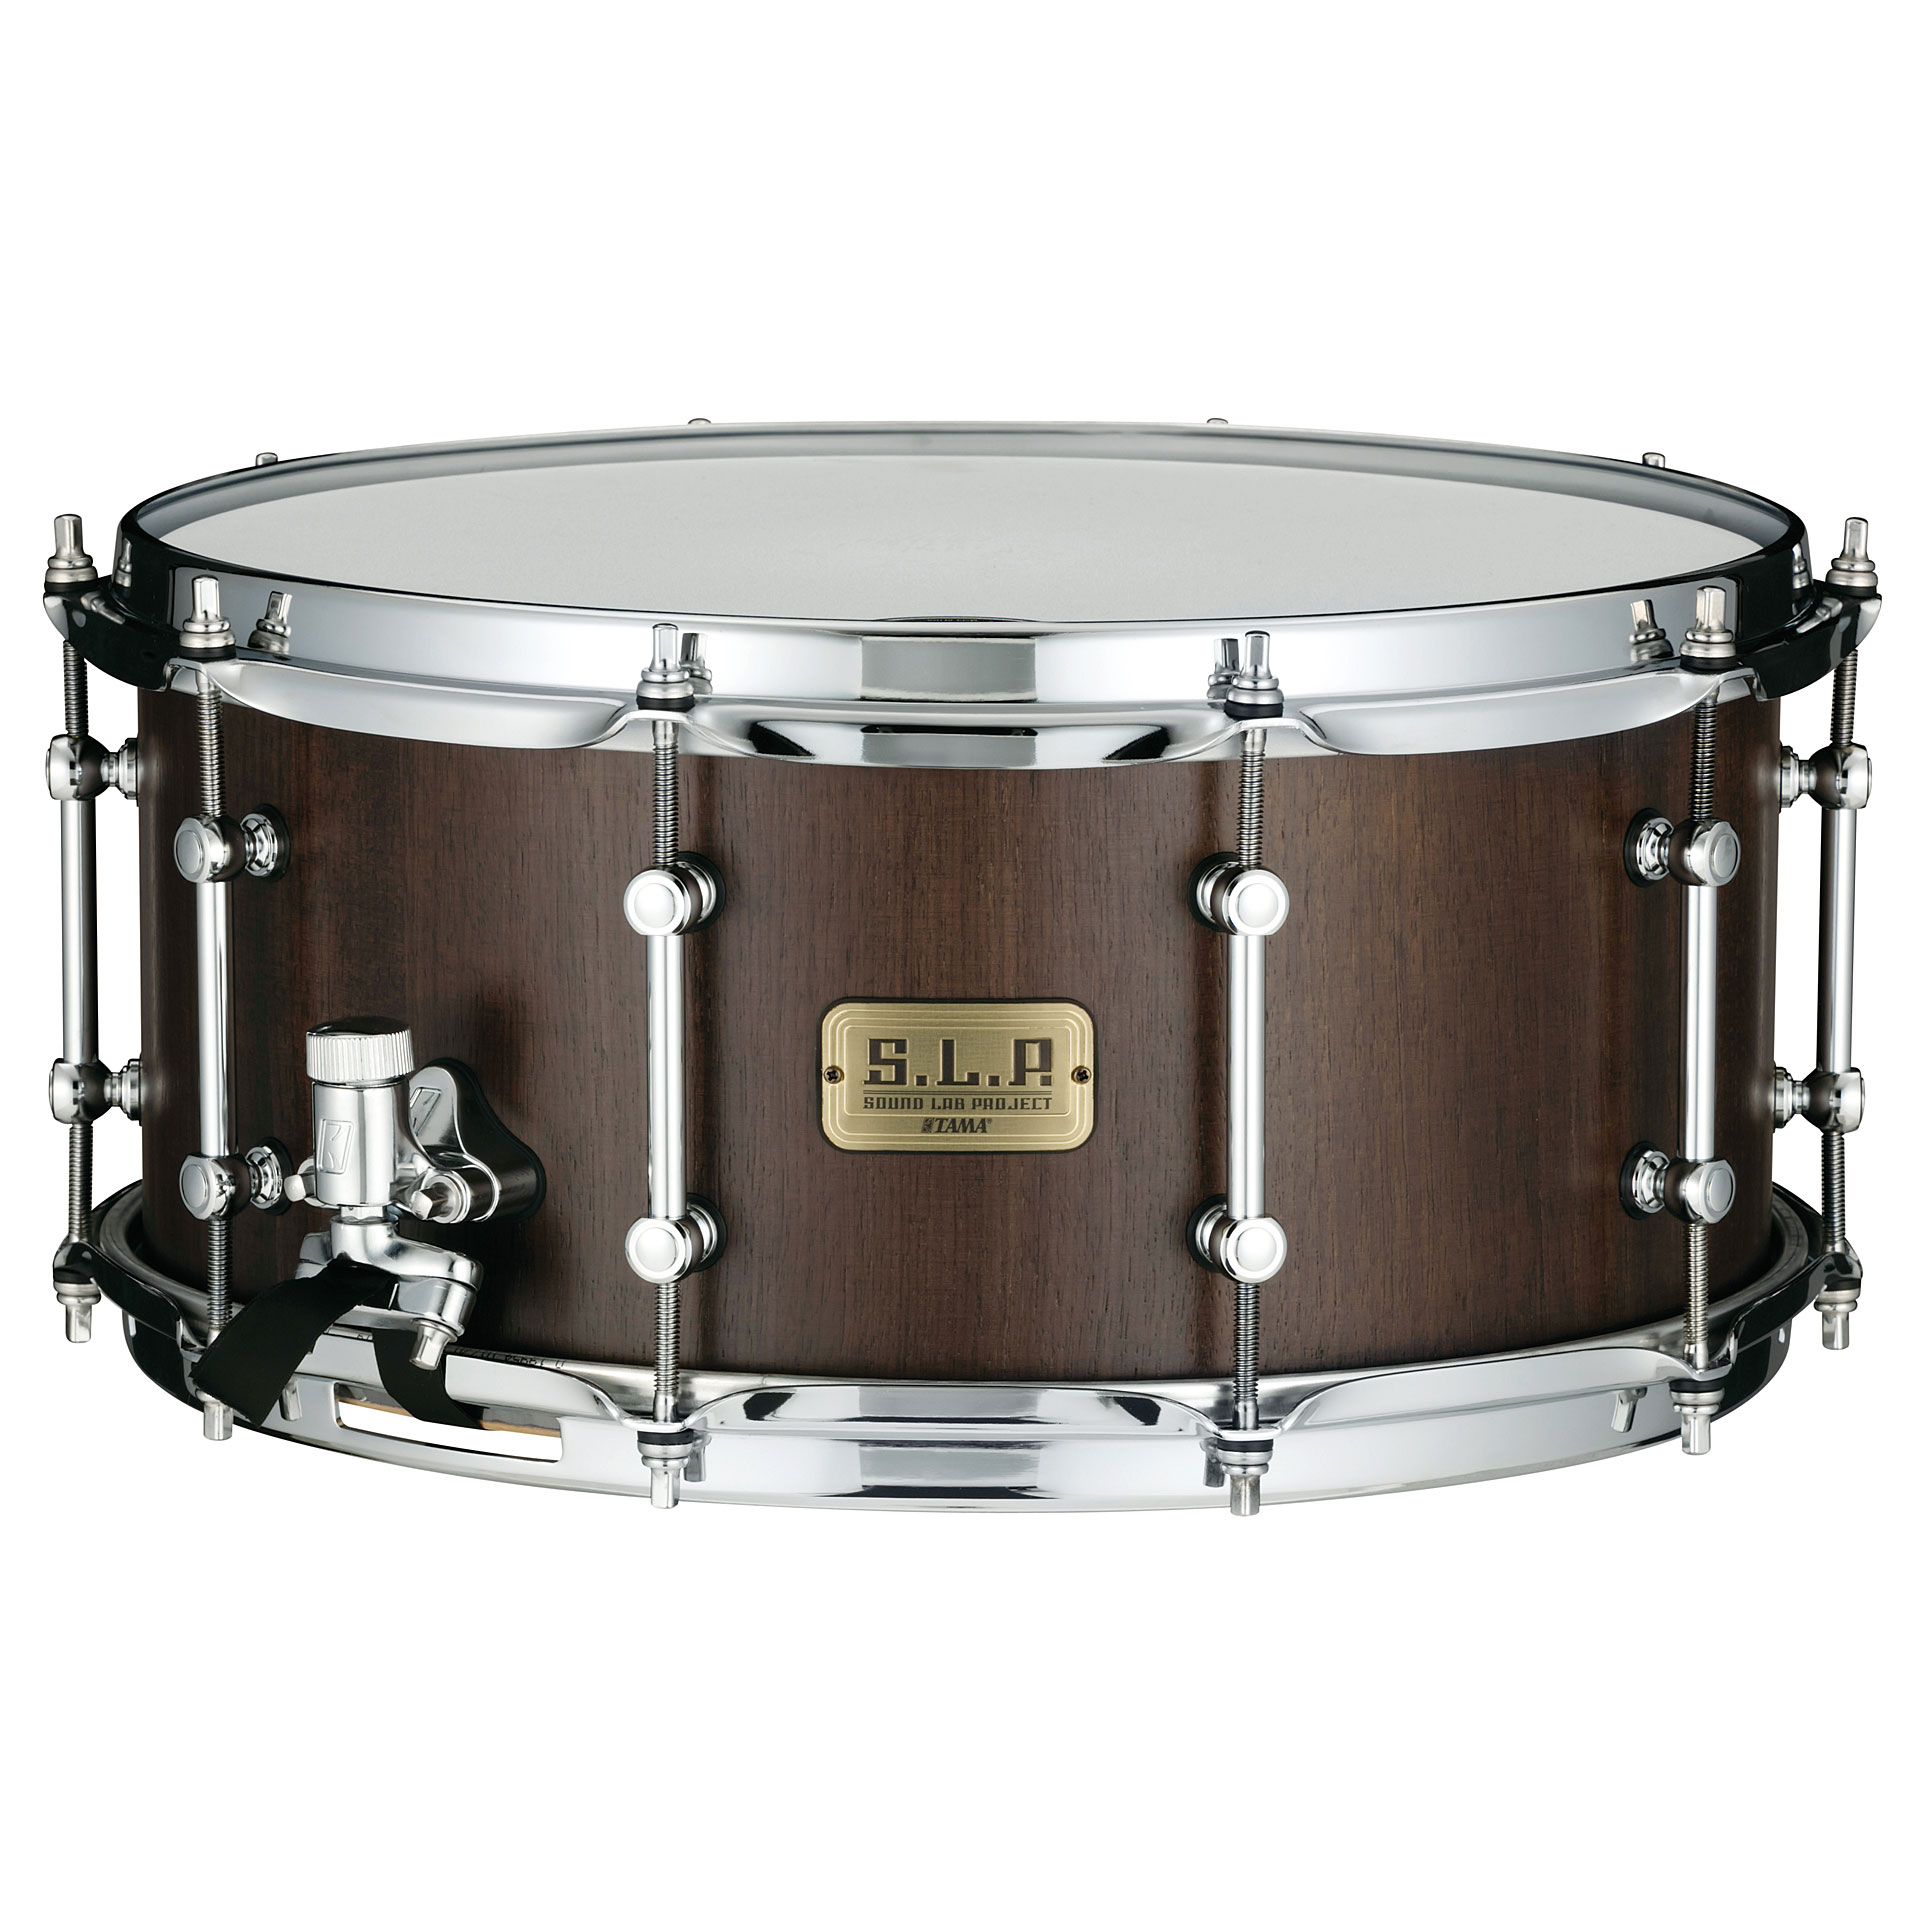 tama s l p 14 x 6 5 g walnut snare snare drum. Black Bedroom Furniture Sets. Home Design Ideas